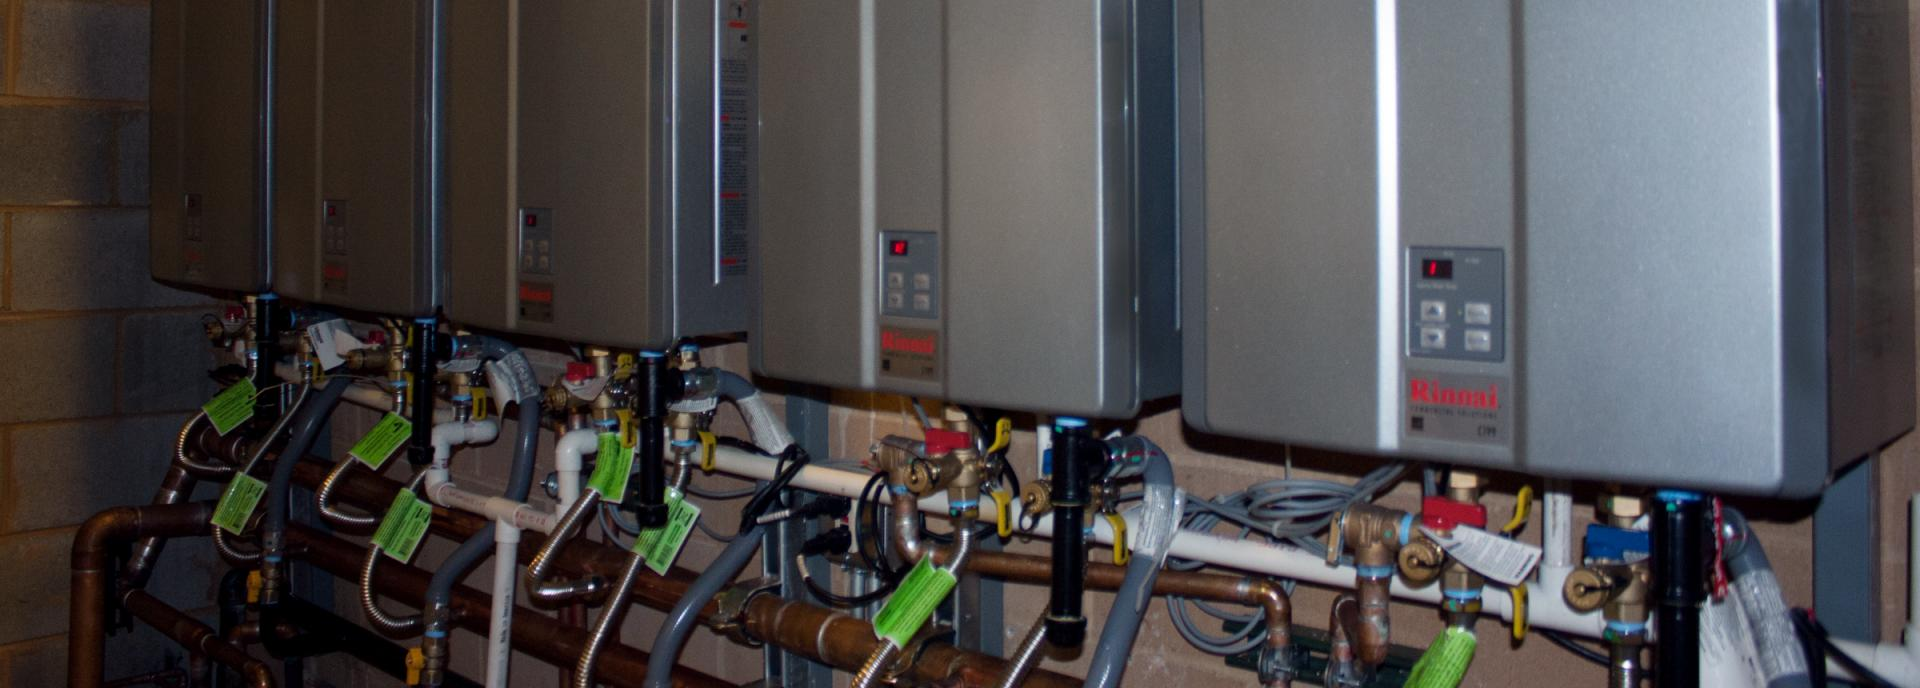 rinnai boilers wiring diagram electrical work wiring diagram u2022 rh aglabs co